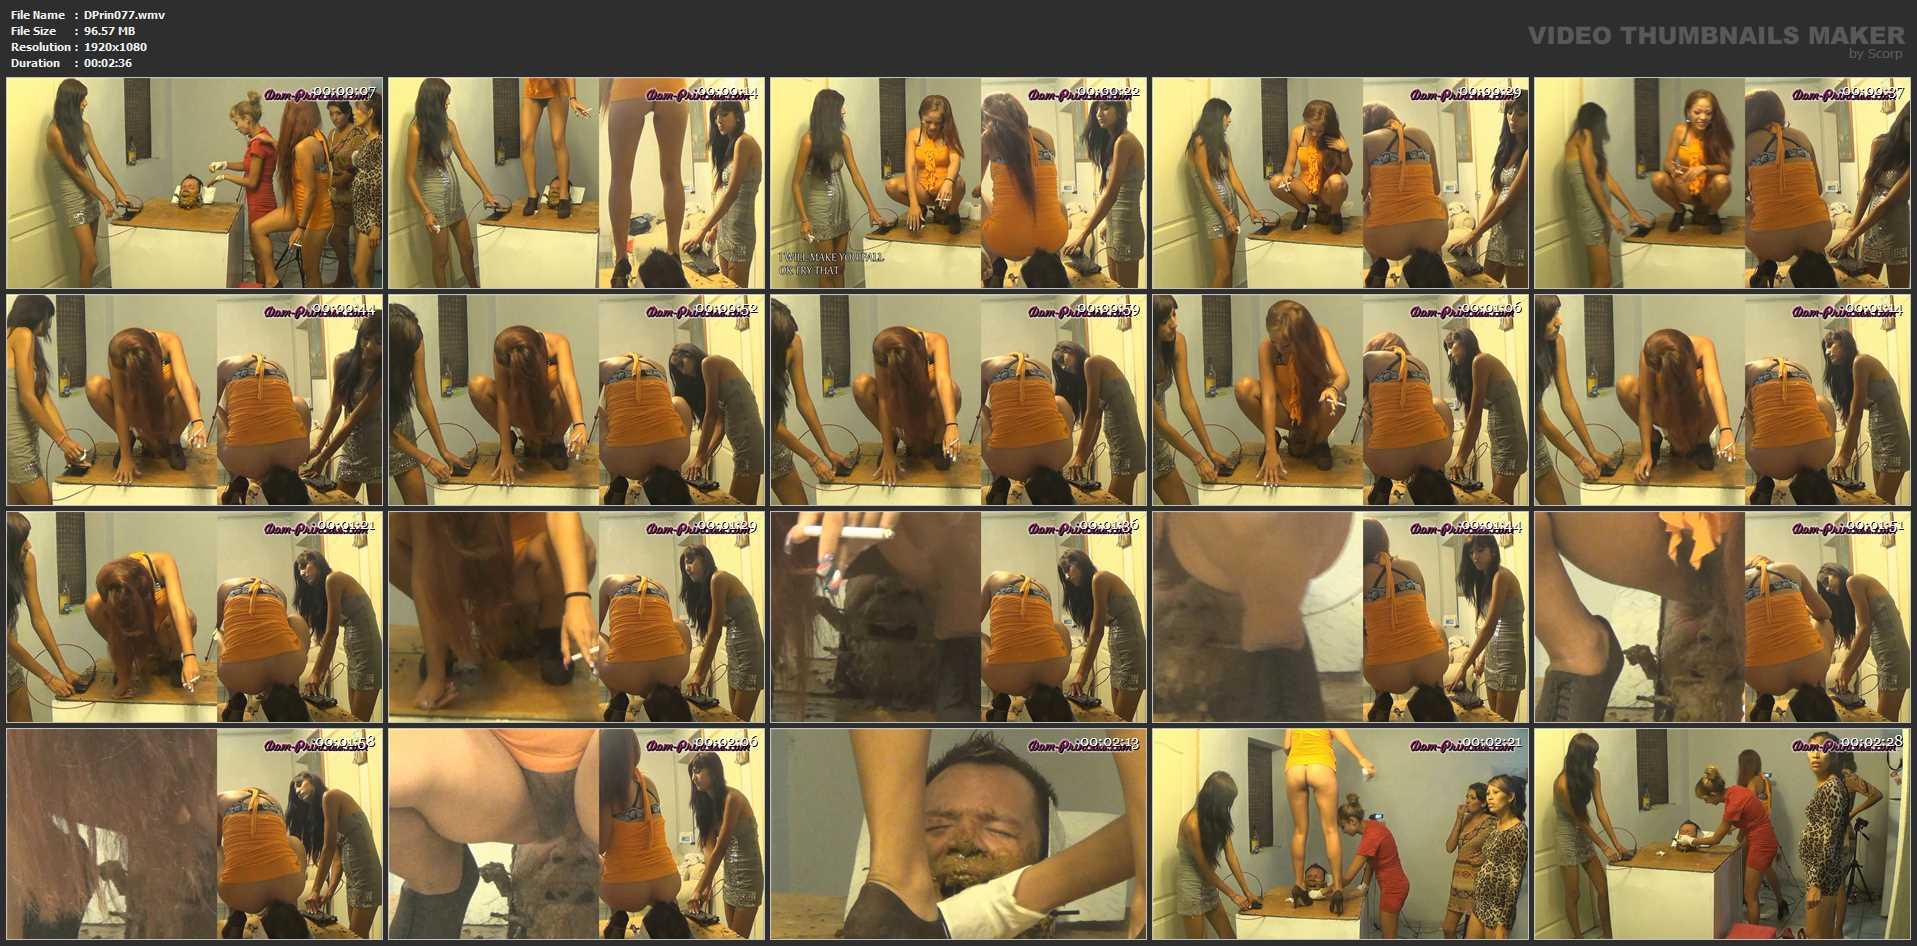 [DOM-PRINCESS] The Washing Machine Part 5 Karina [FULL HD][1080p][WMV]